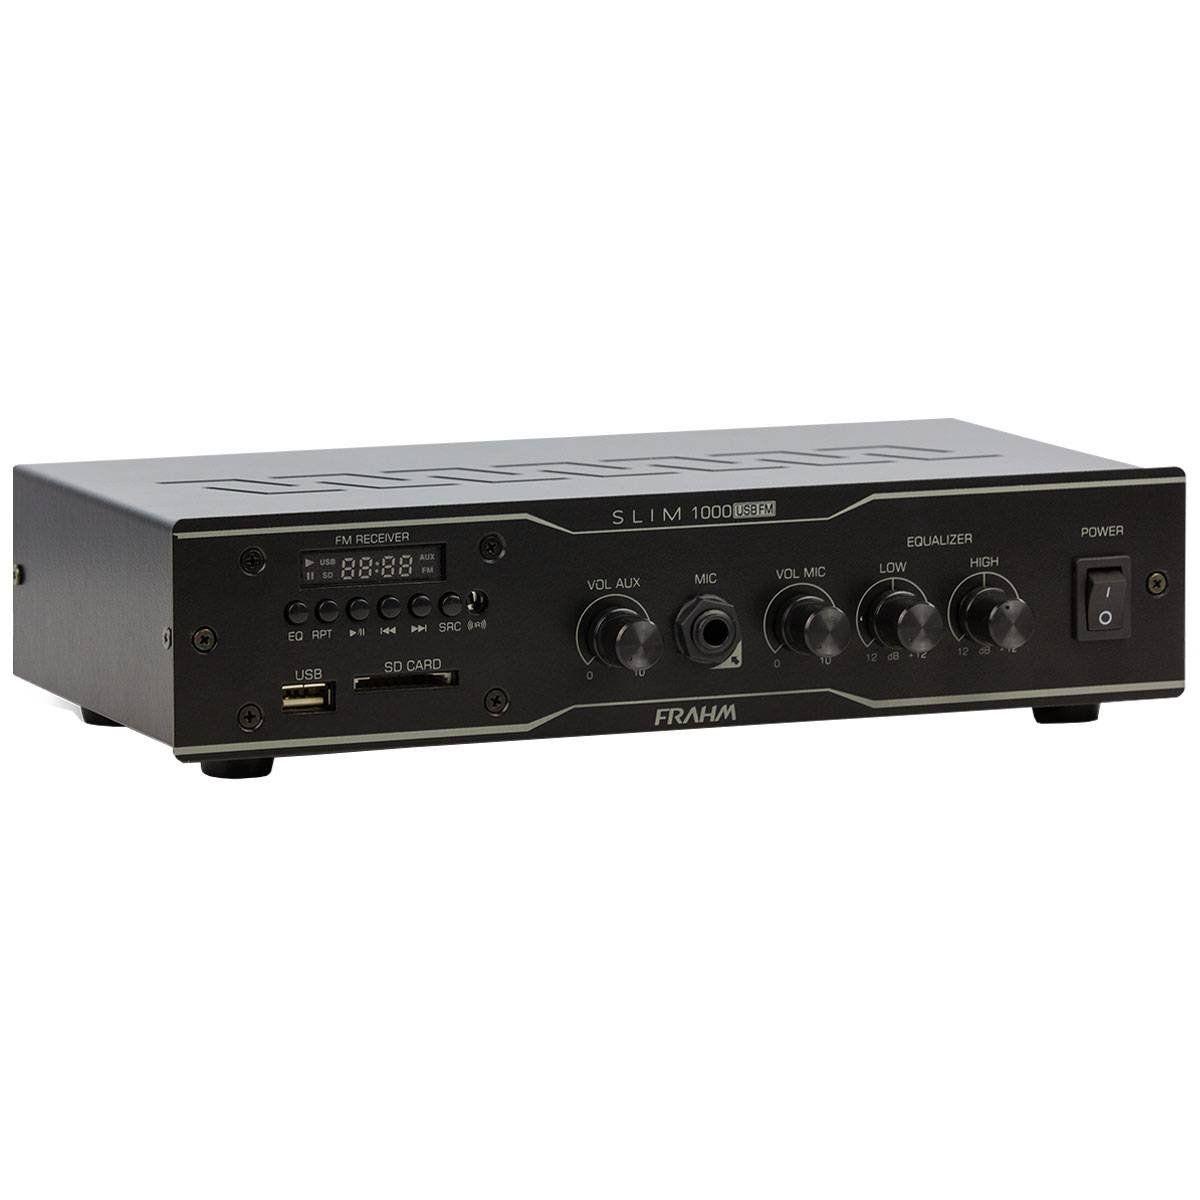 AMPLIF DE POTENCIA RECEIVER 60W RMS SLIM1000 USB FM FRAHM